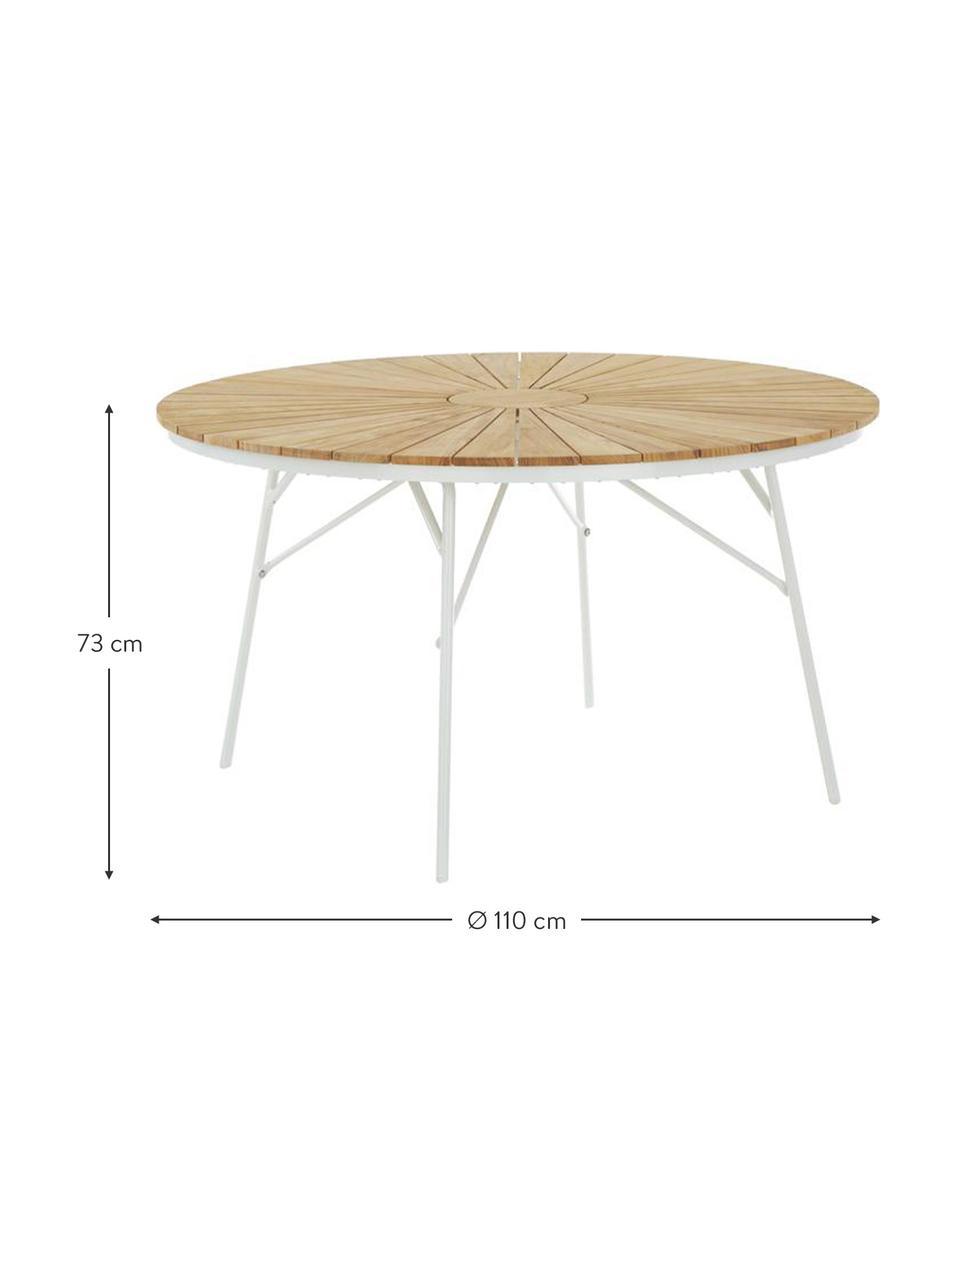 Table de jardin ronde avec plateau teck Hard & Ellen, Teck, blanc